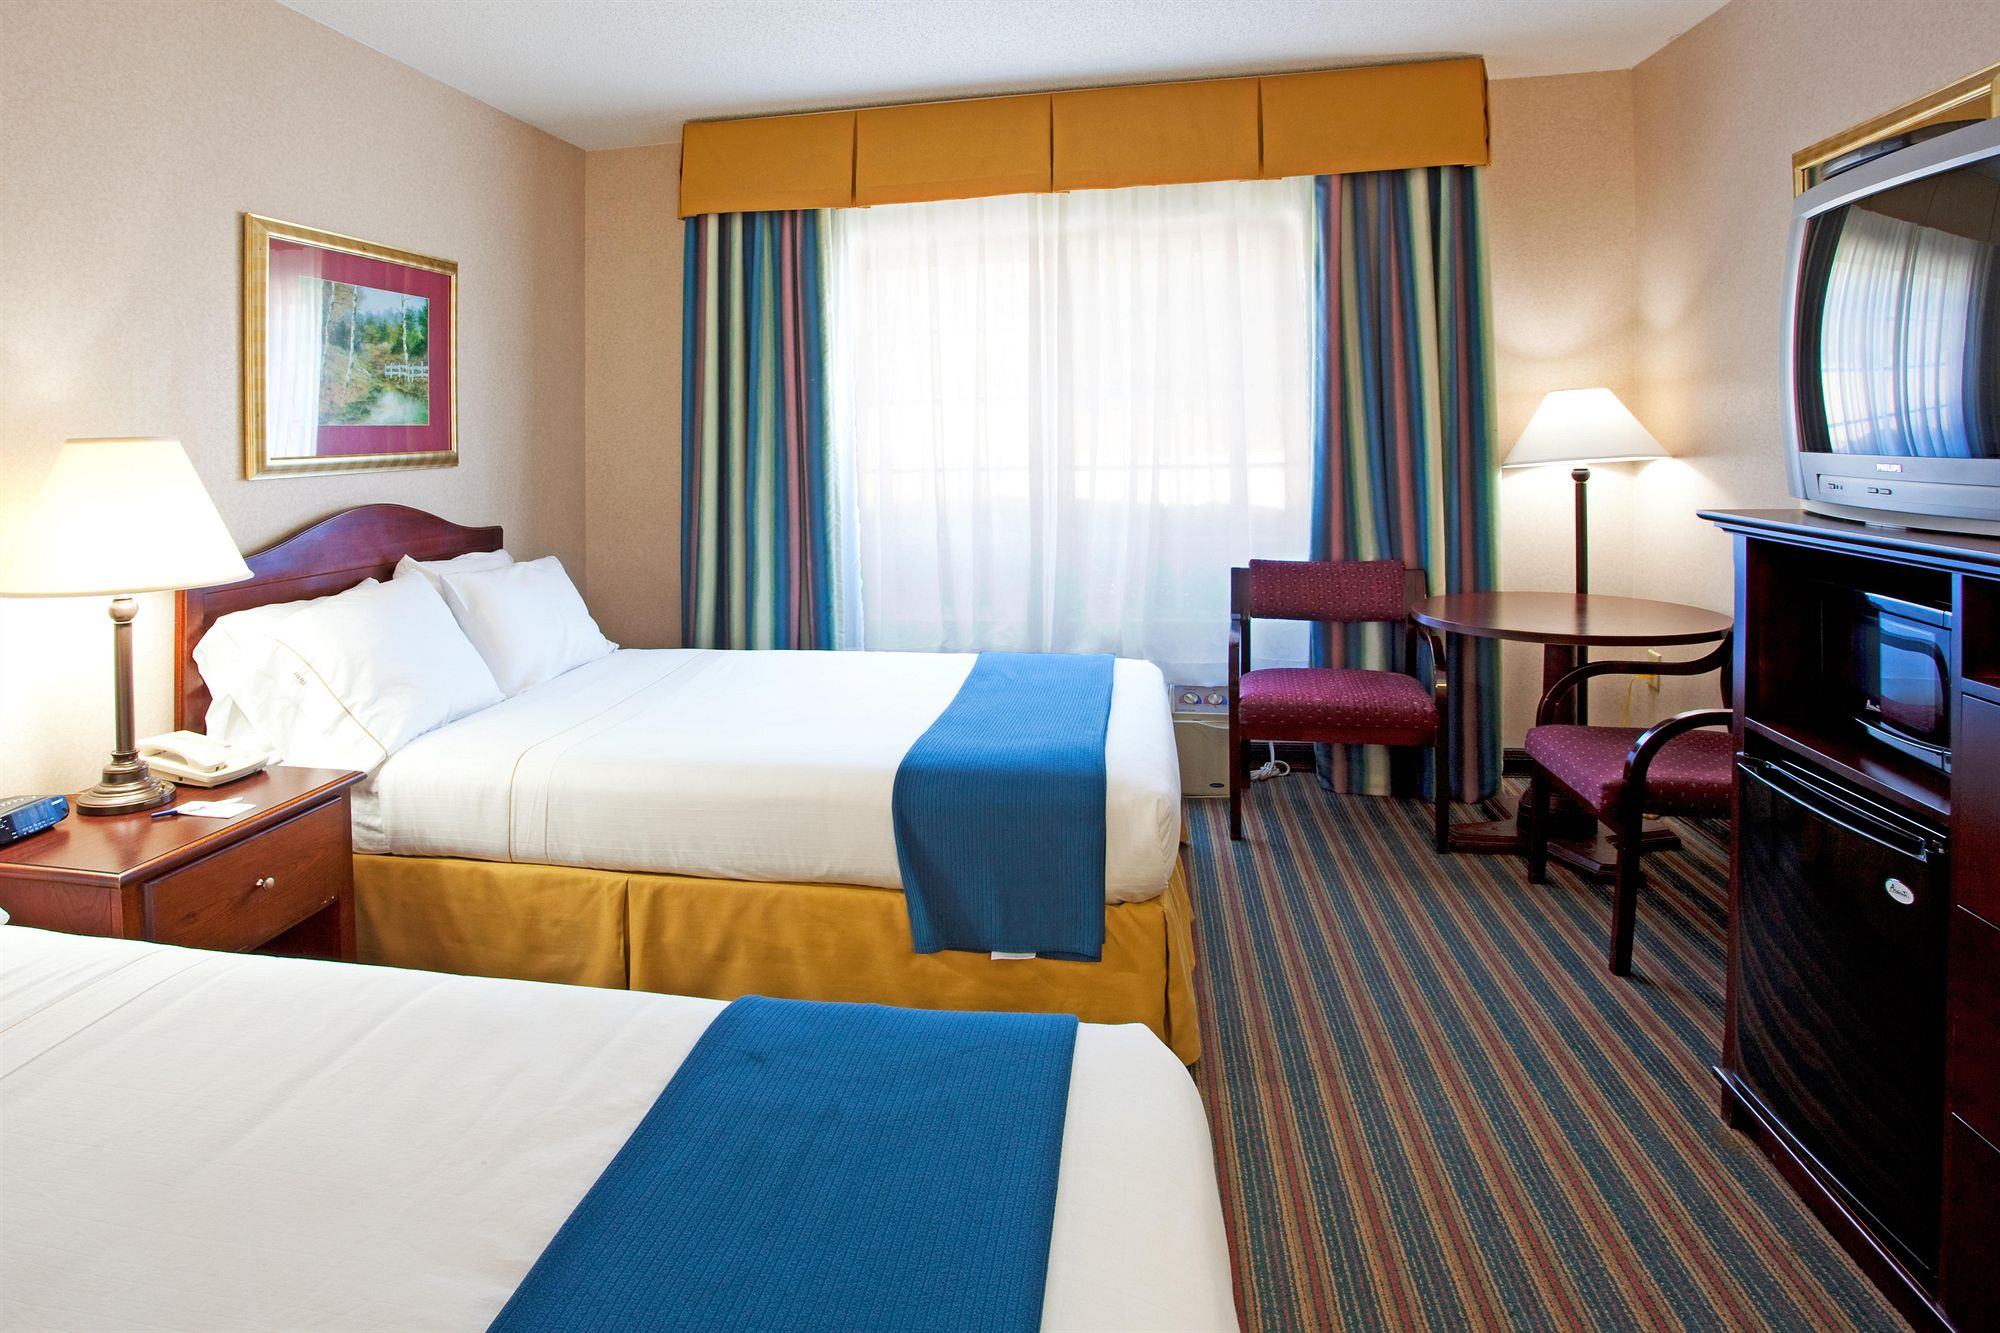 Holiday Inn Express Braselton in Braselton, GA